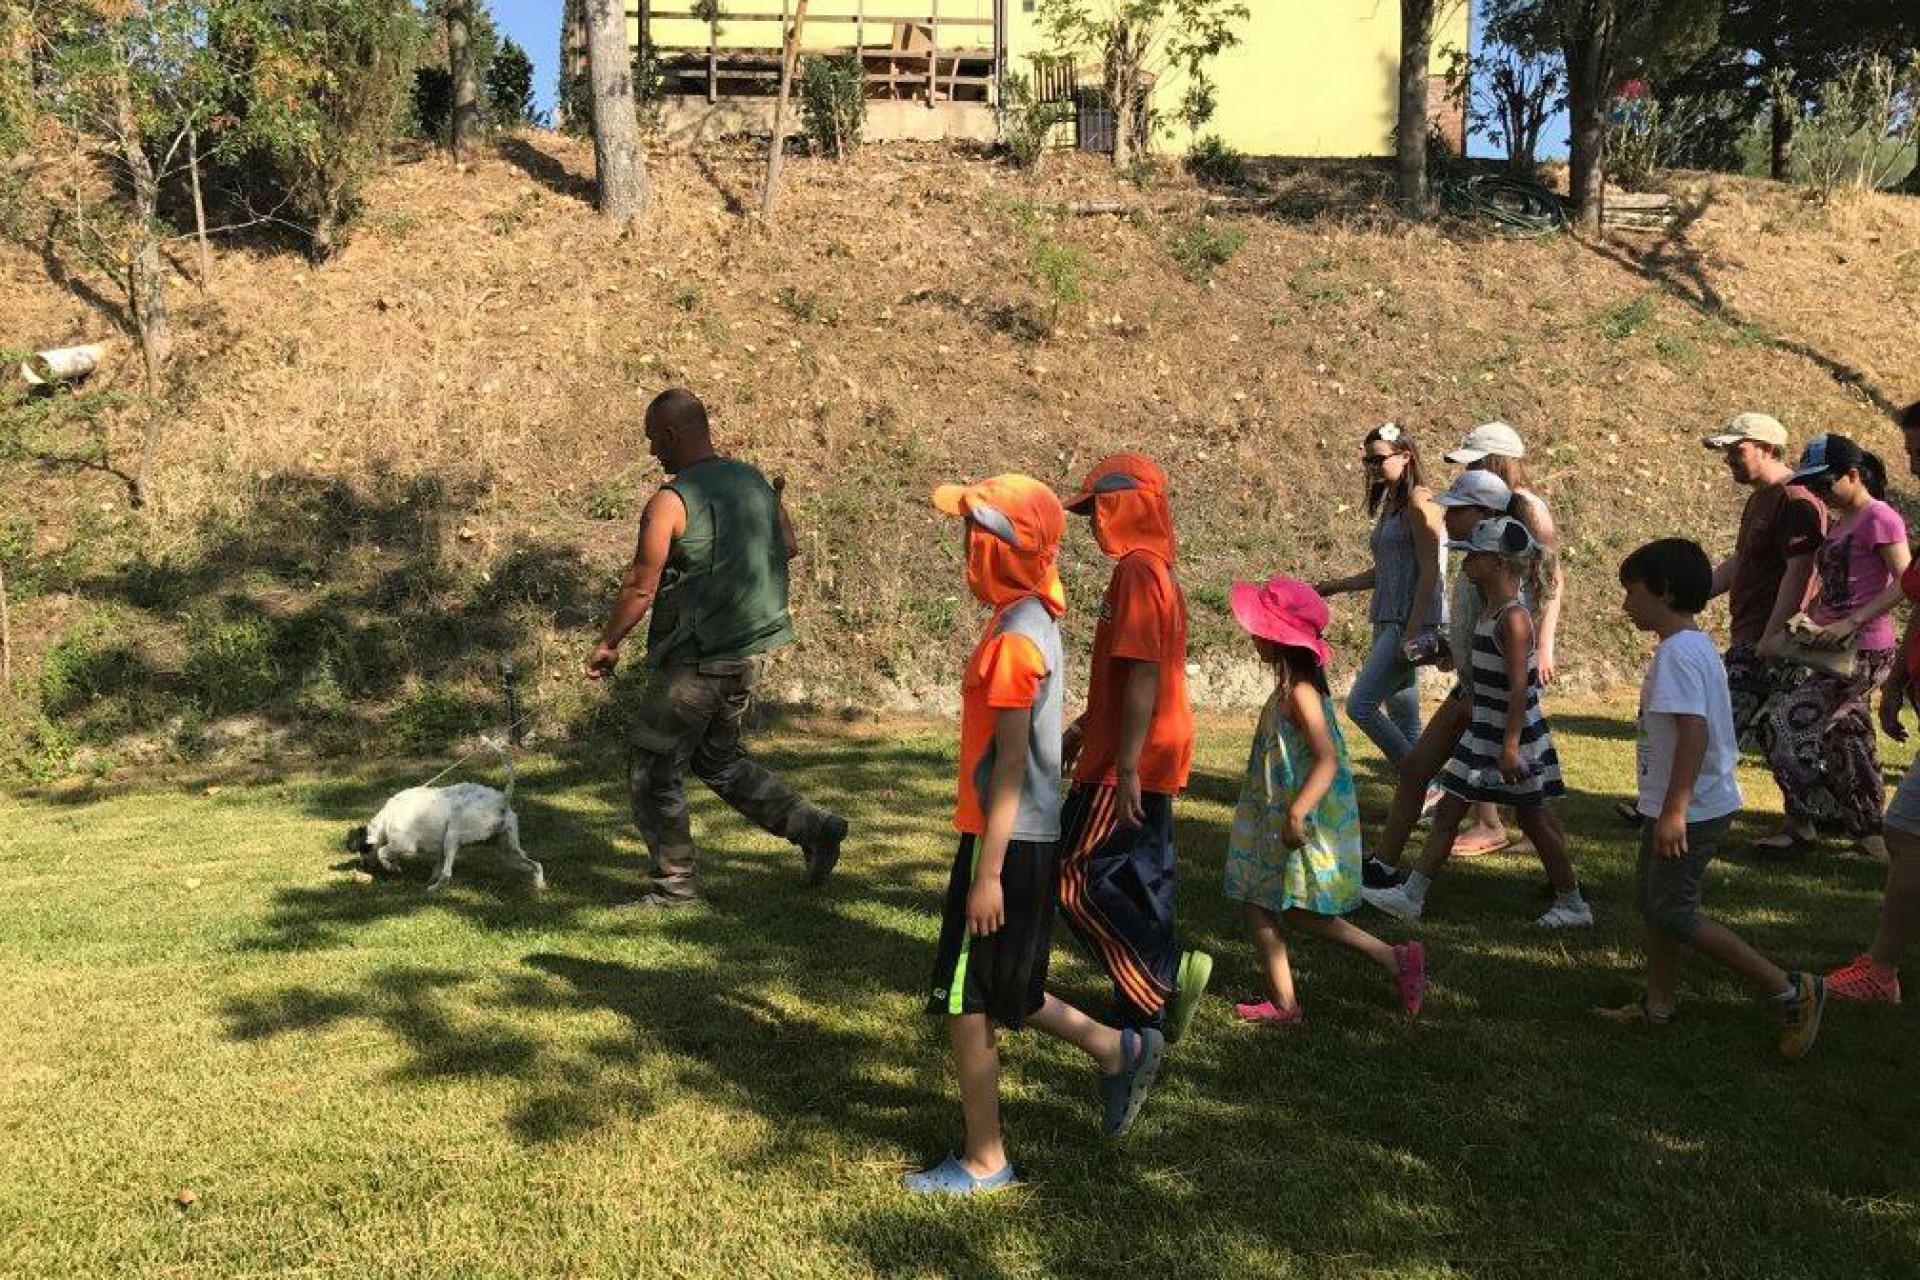 Agriturismo Toskana Kinderfreundlicher Urlaub Toskana - mit schönem Pool | myitalyselection.de